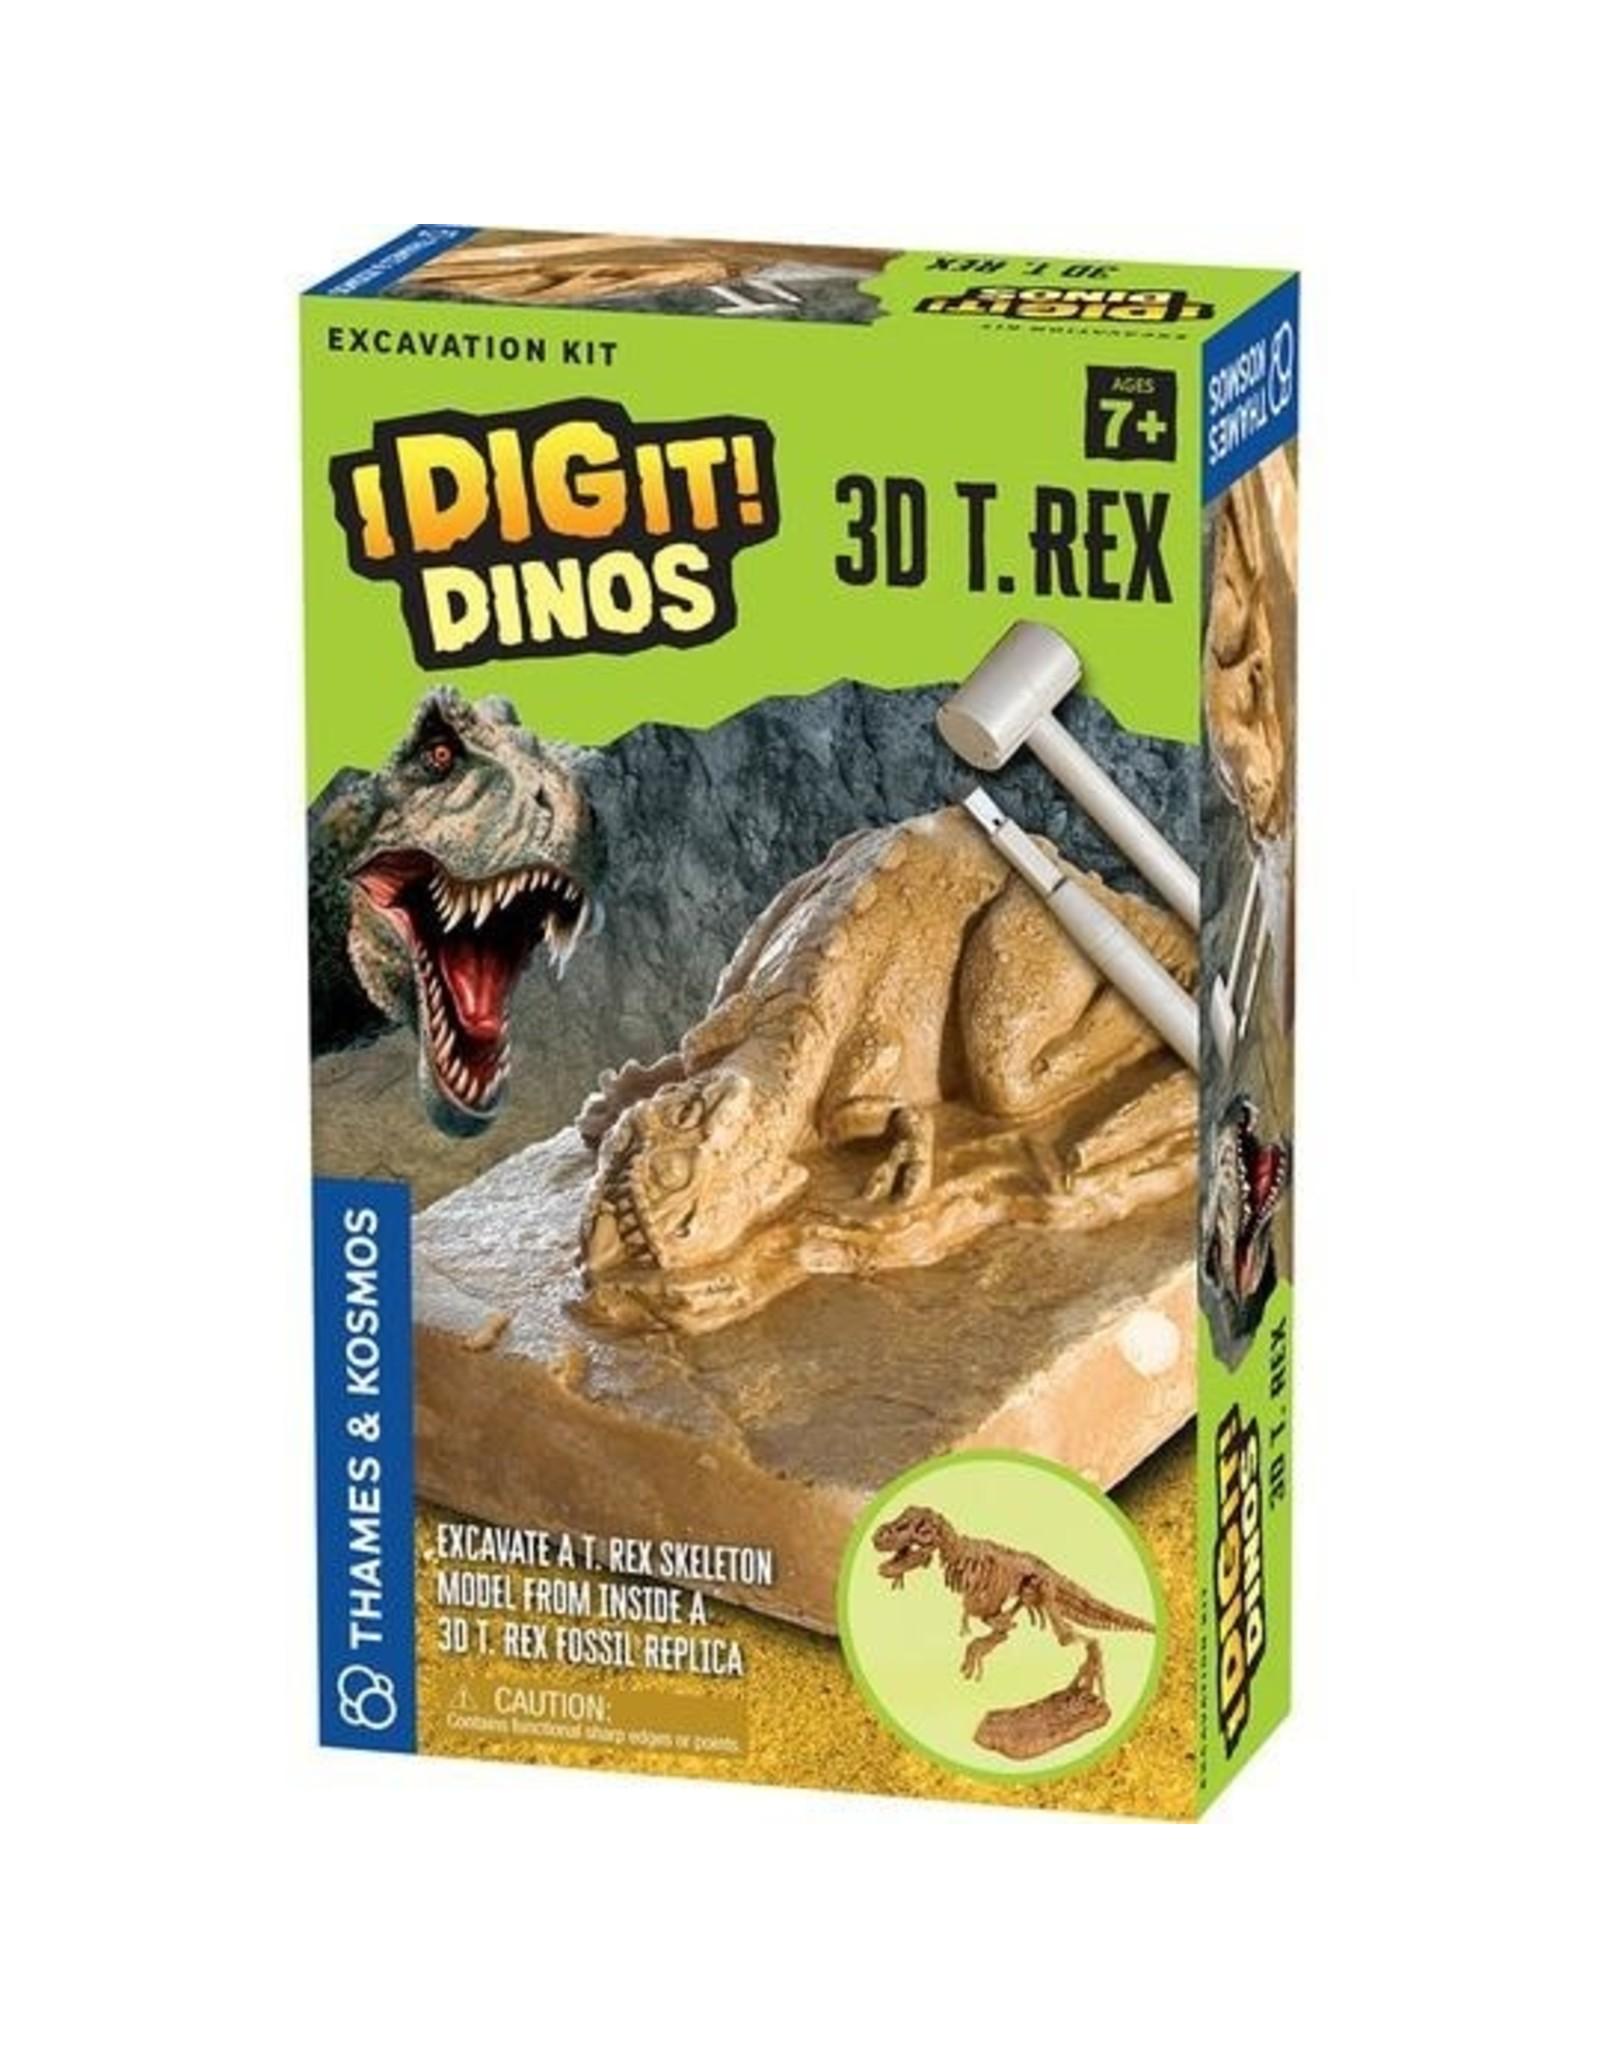 Thames and Kosmos I Dig It! Dinos - 3D T. Rex Excavation Kit